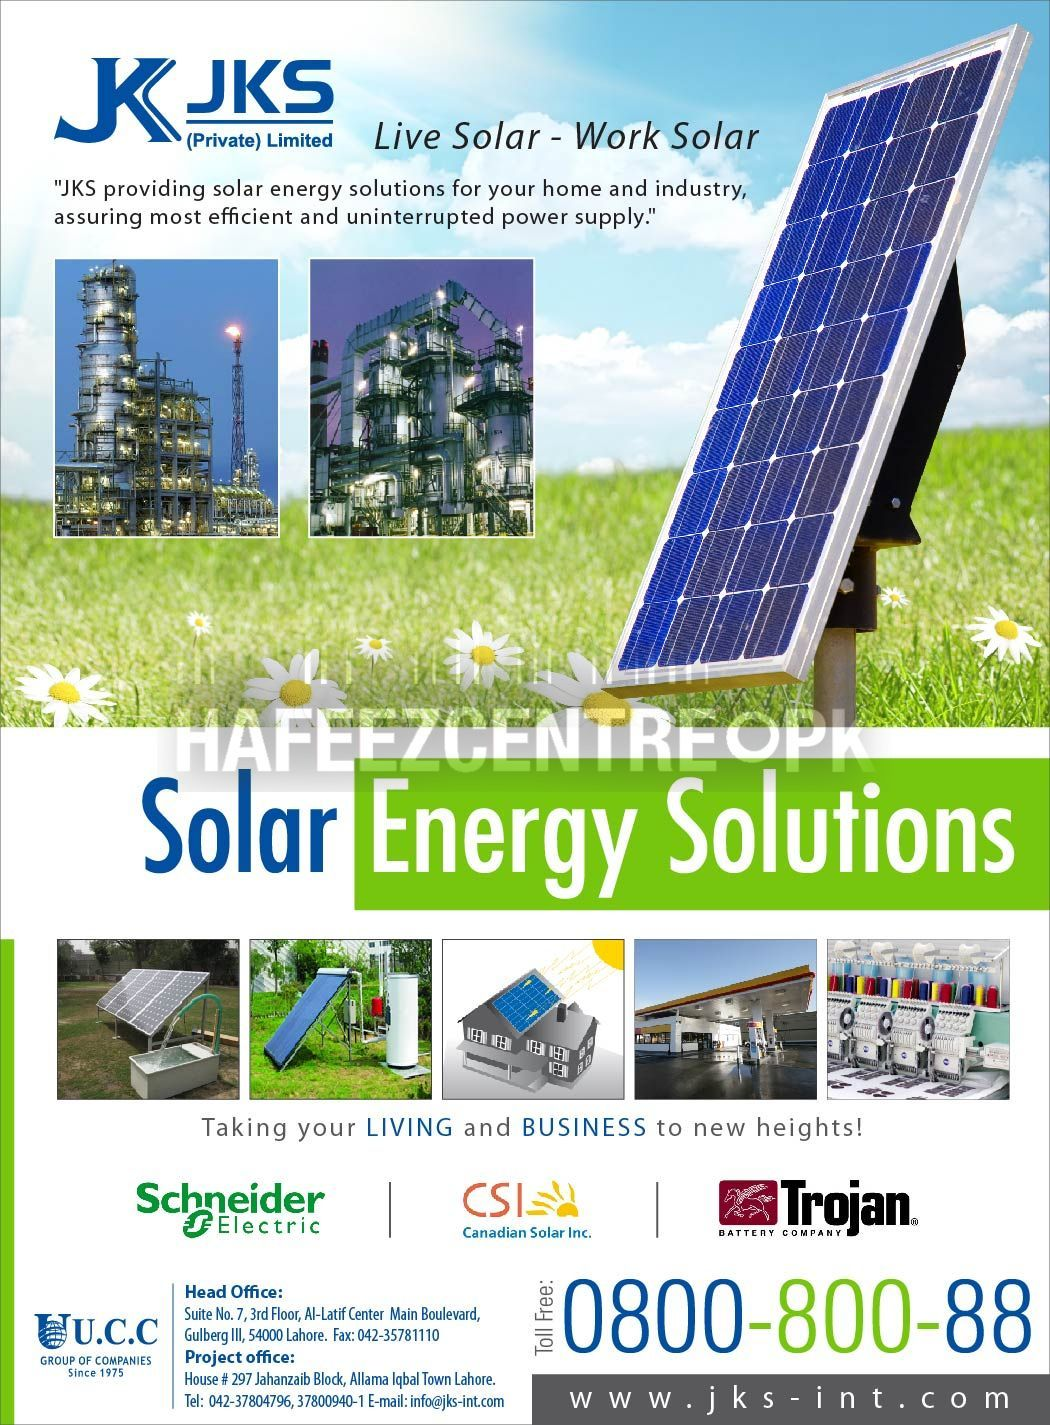 Hc135408073073 Jpg 1050 1425 Solar Energy Solutions Solar Roof Solar Panel